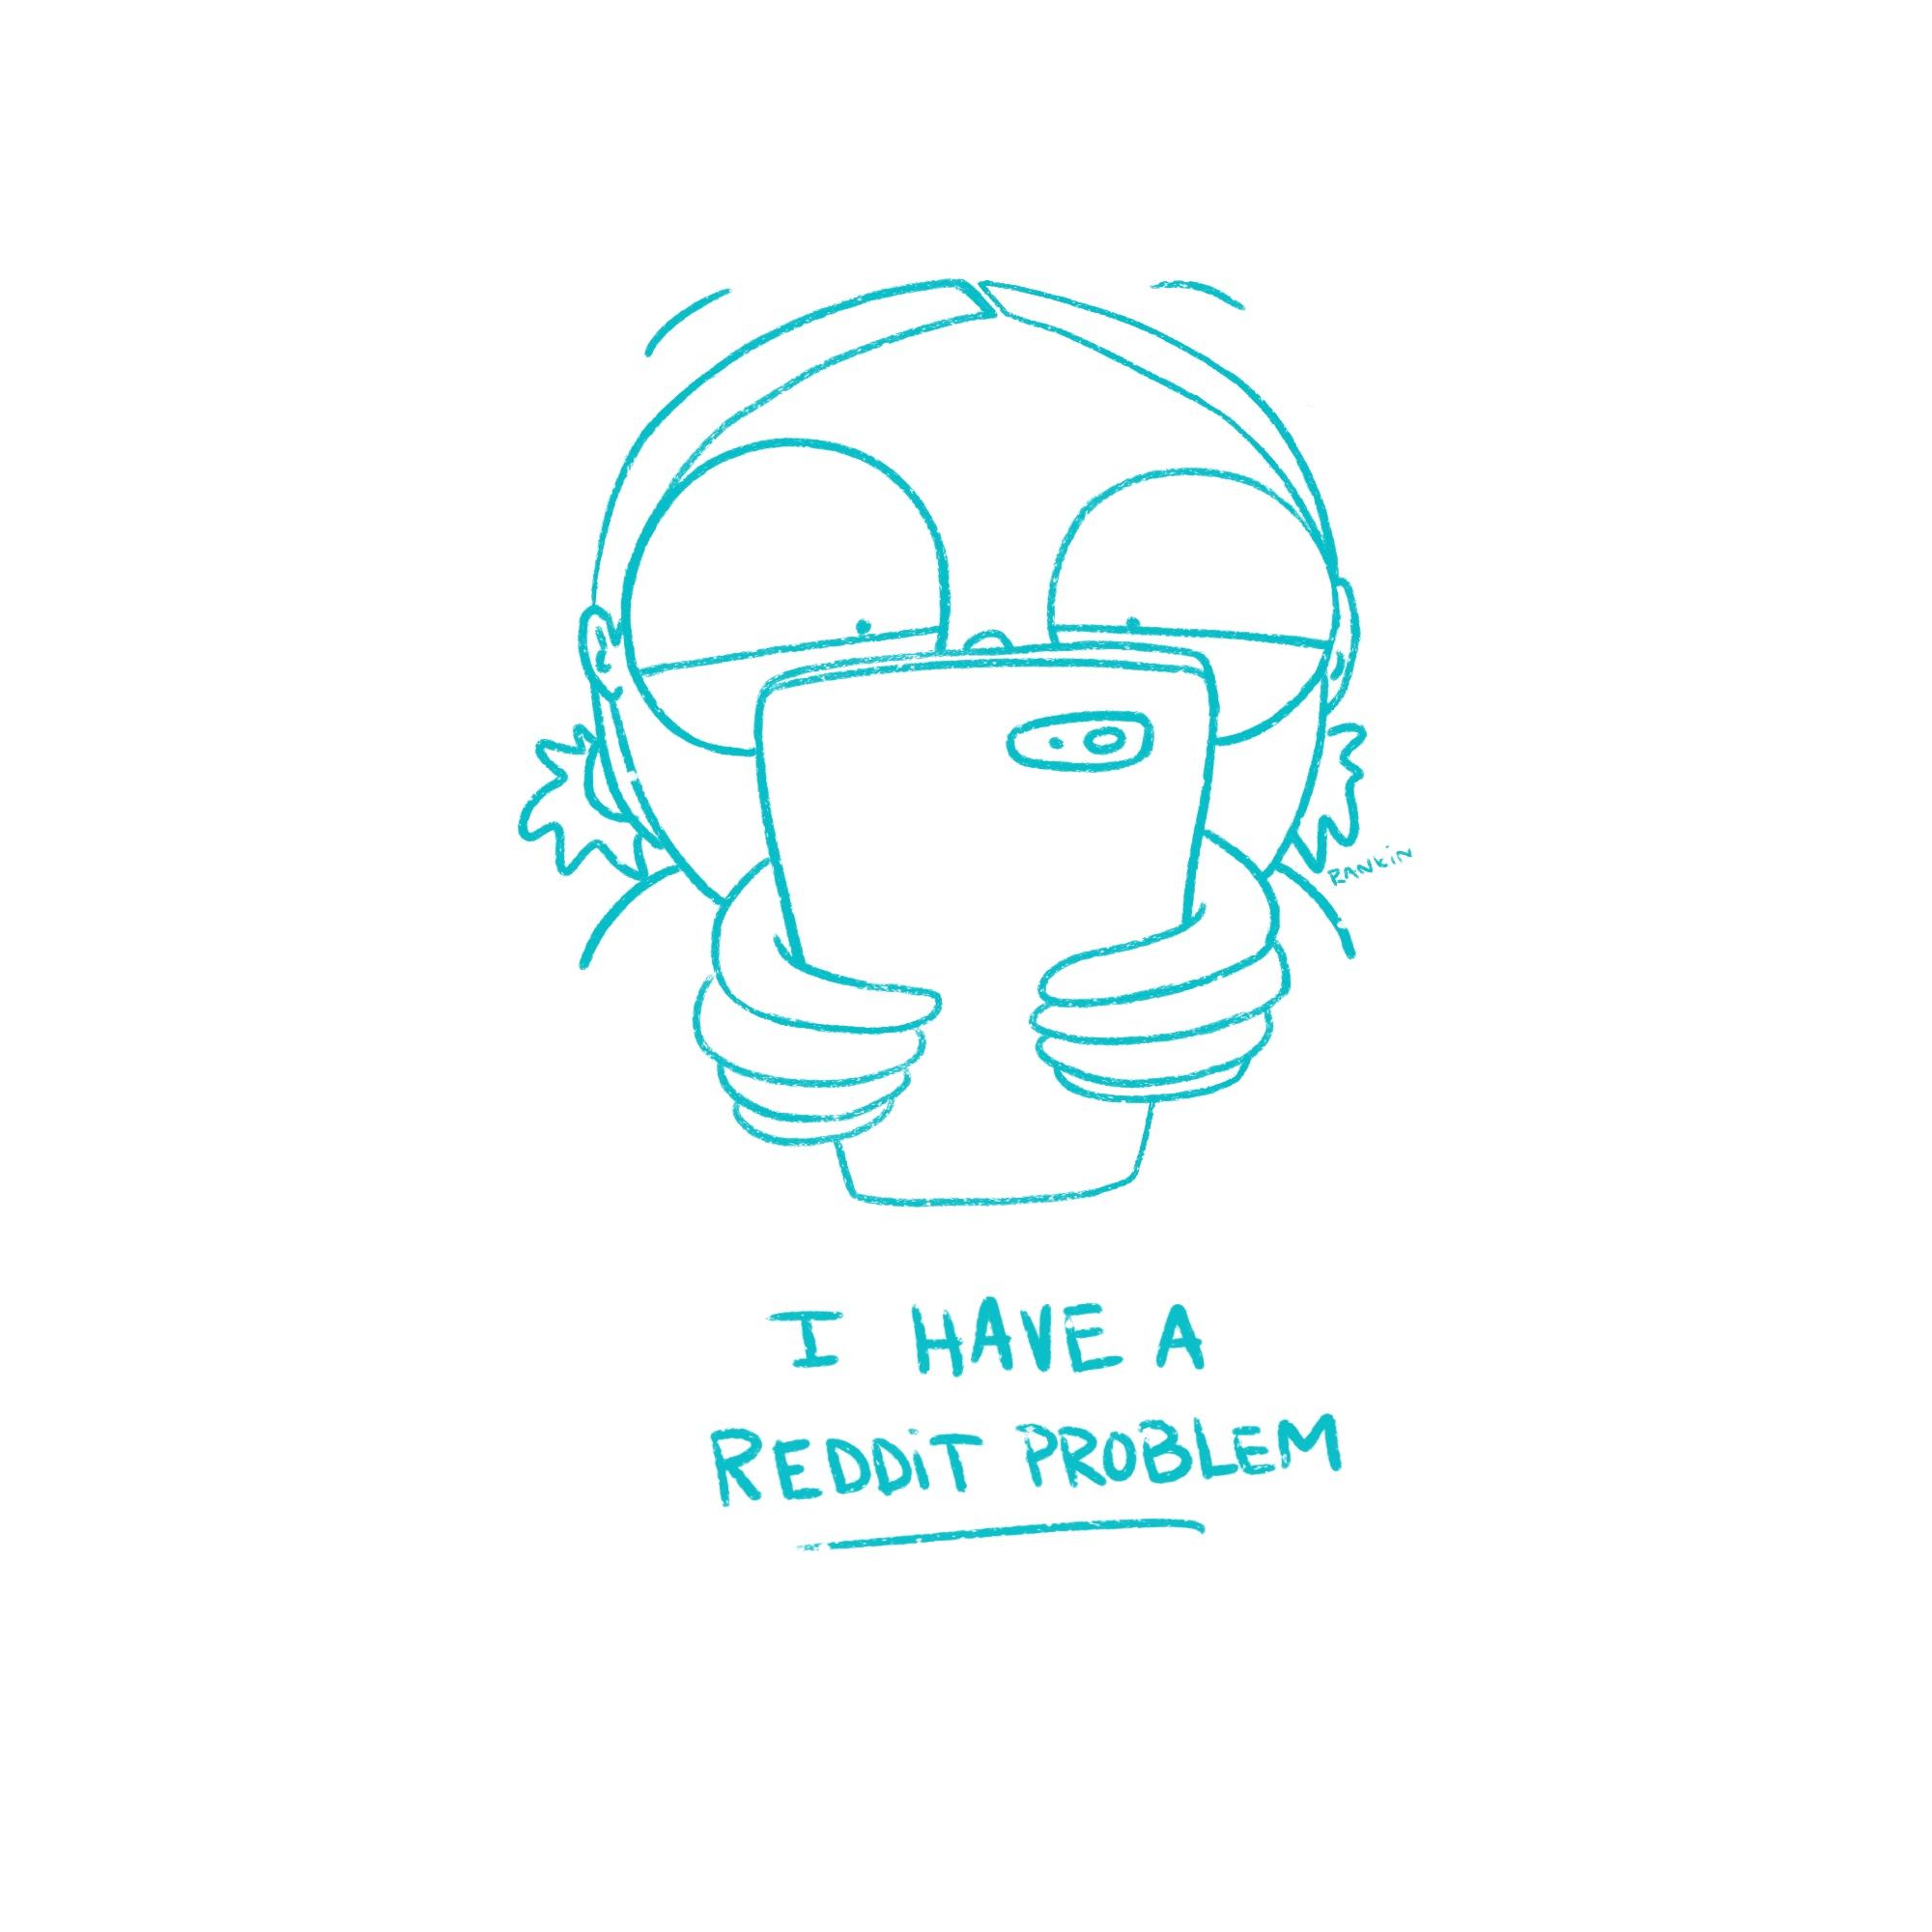 Reddit Problem.JPG